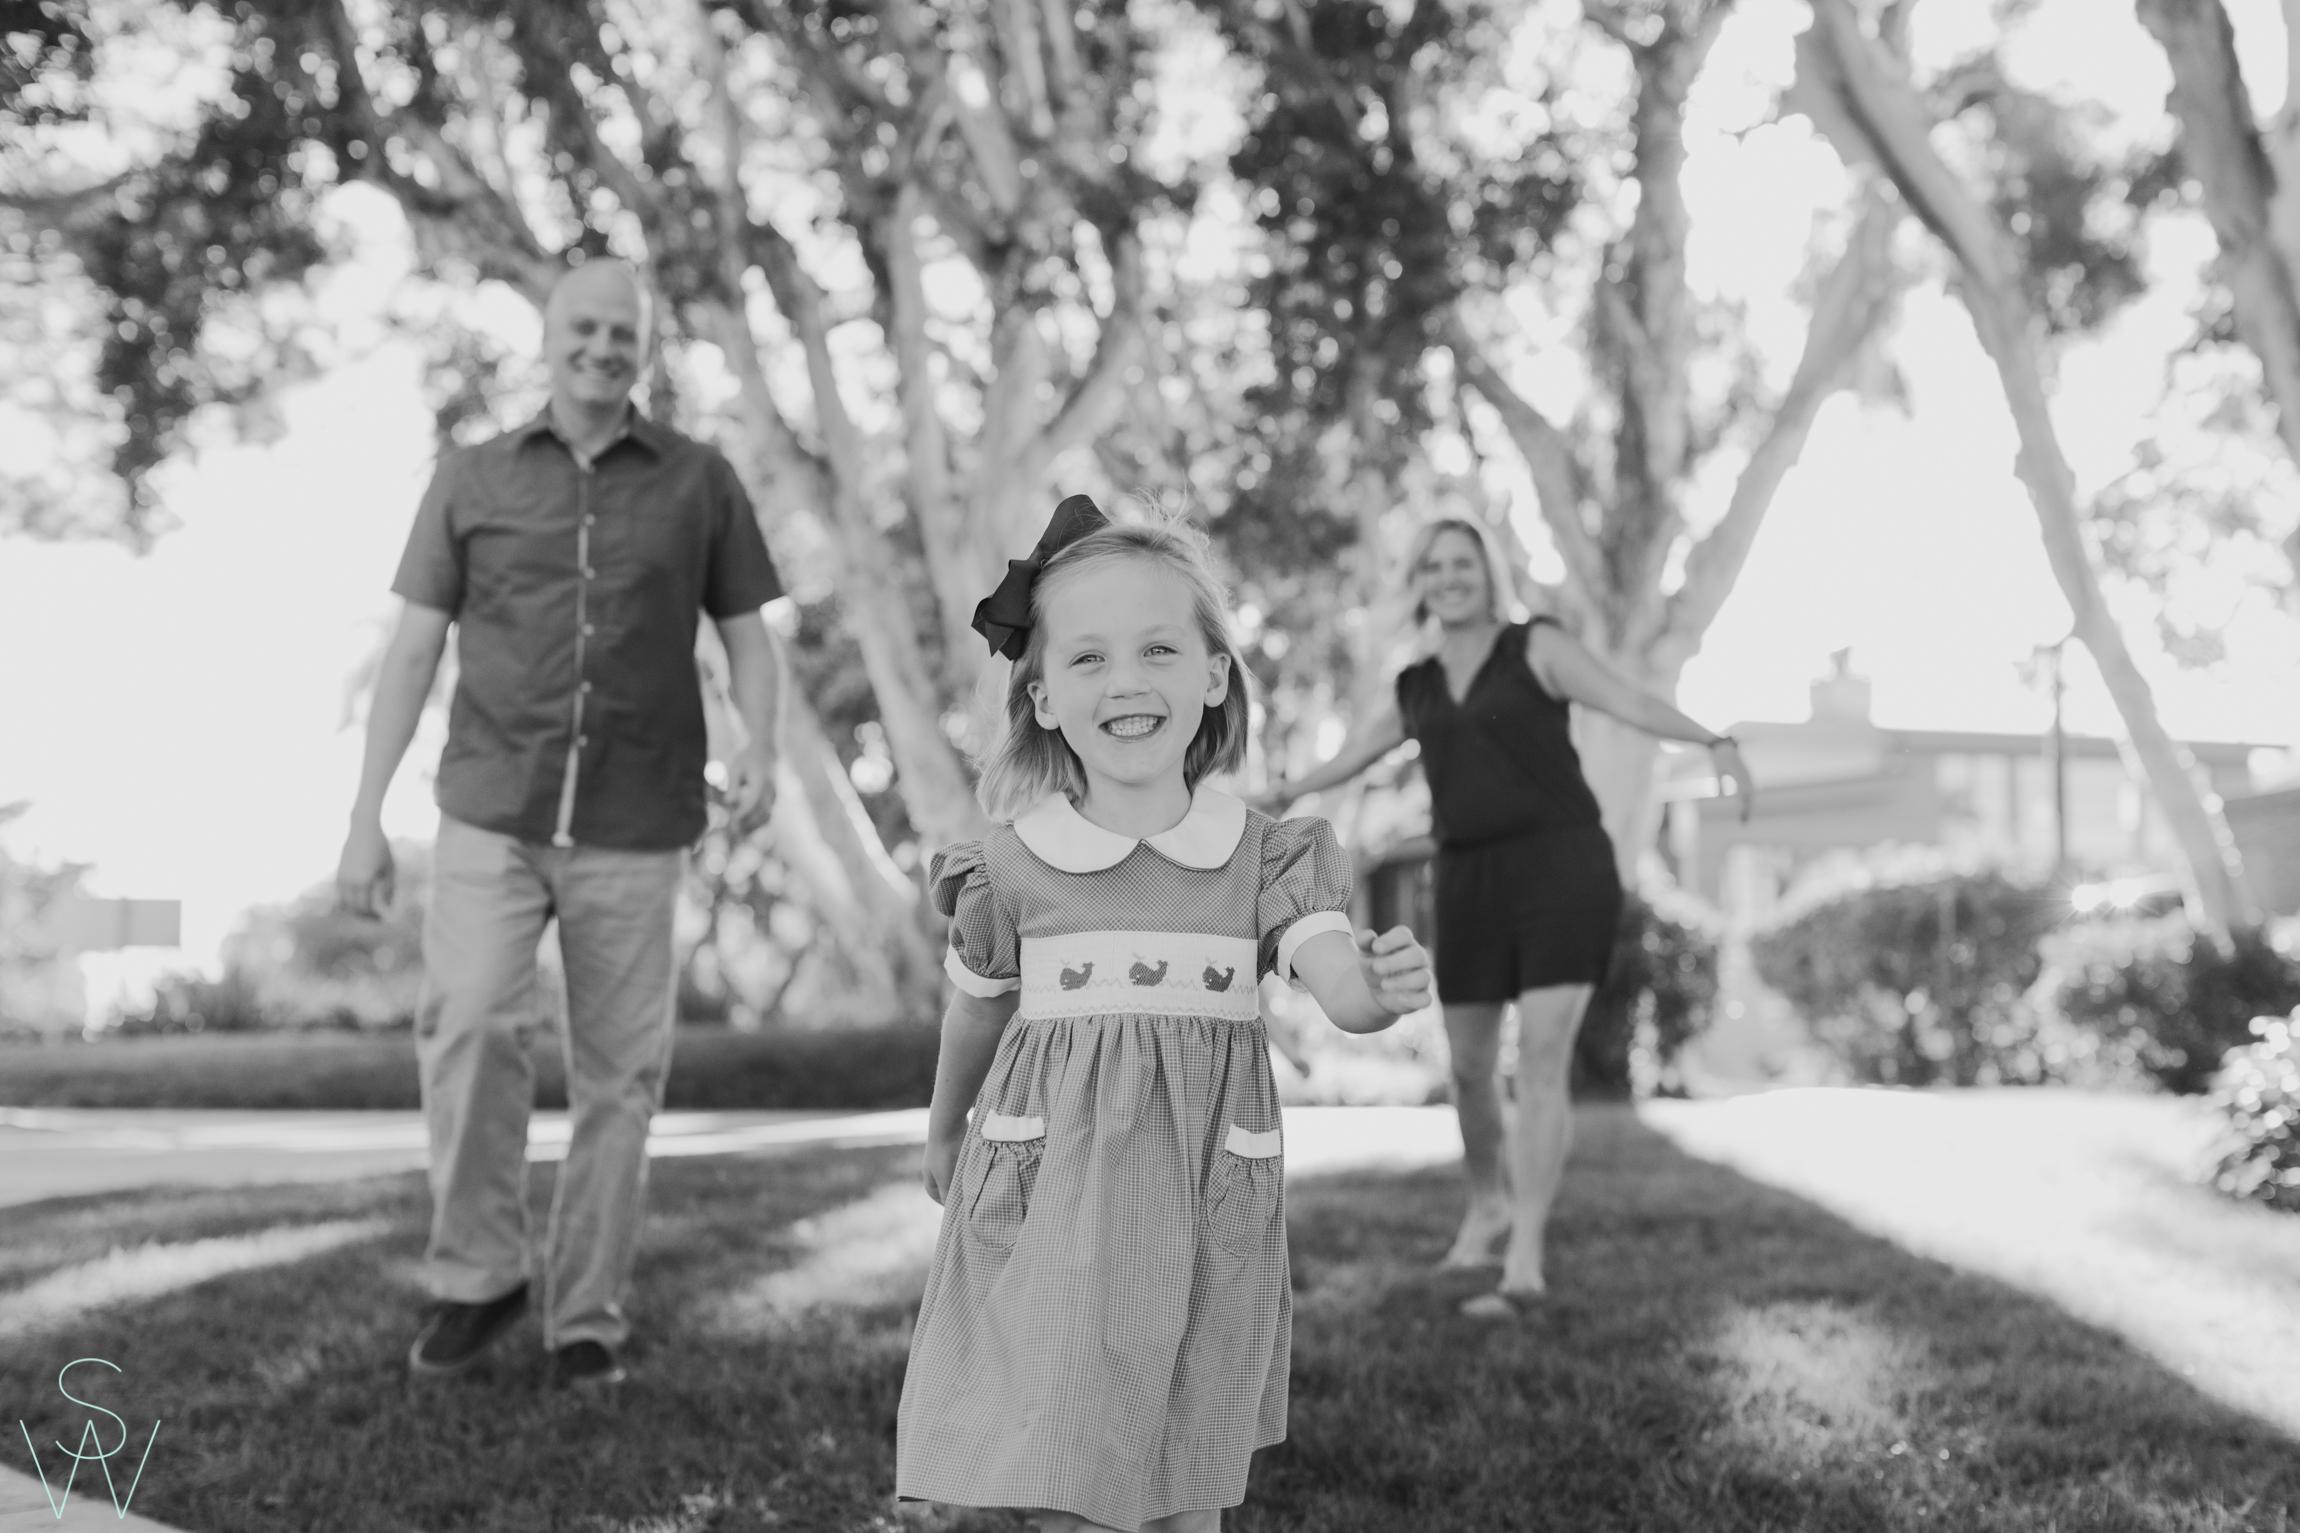 coronado.family.photography.shewanders-27.jpg